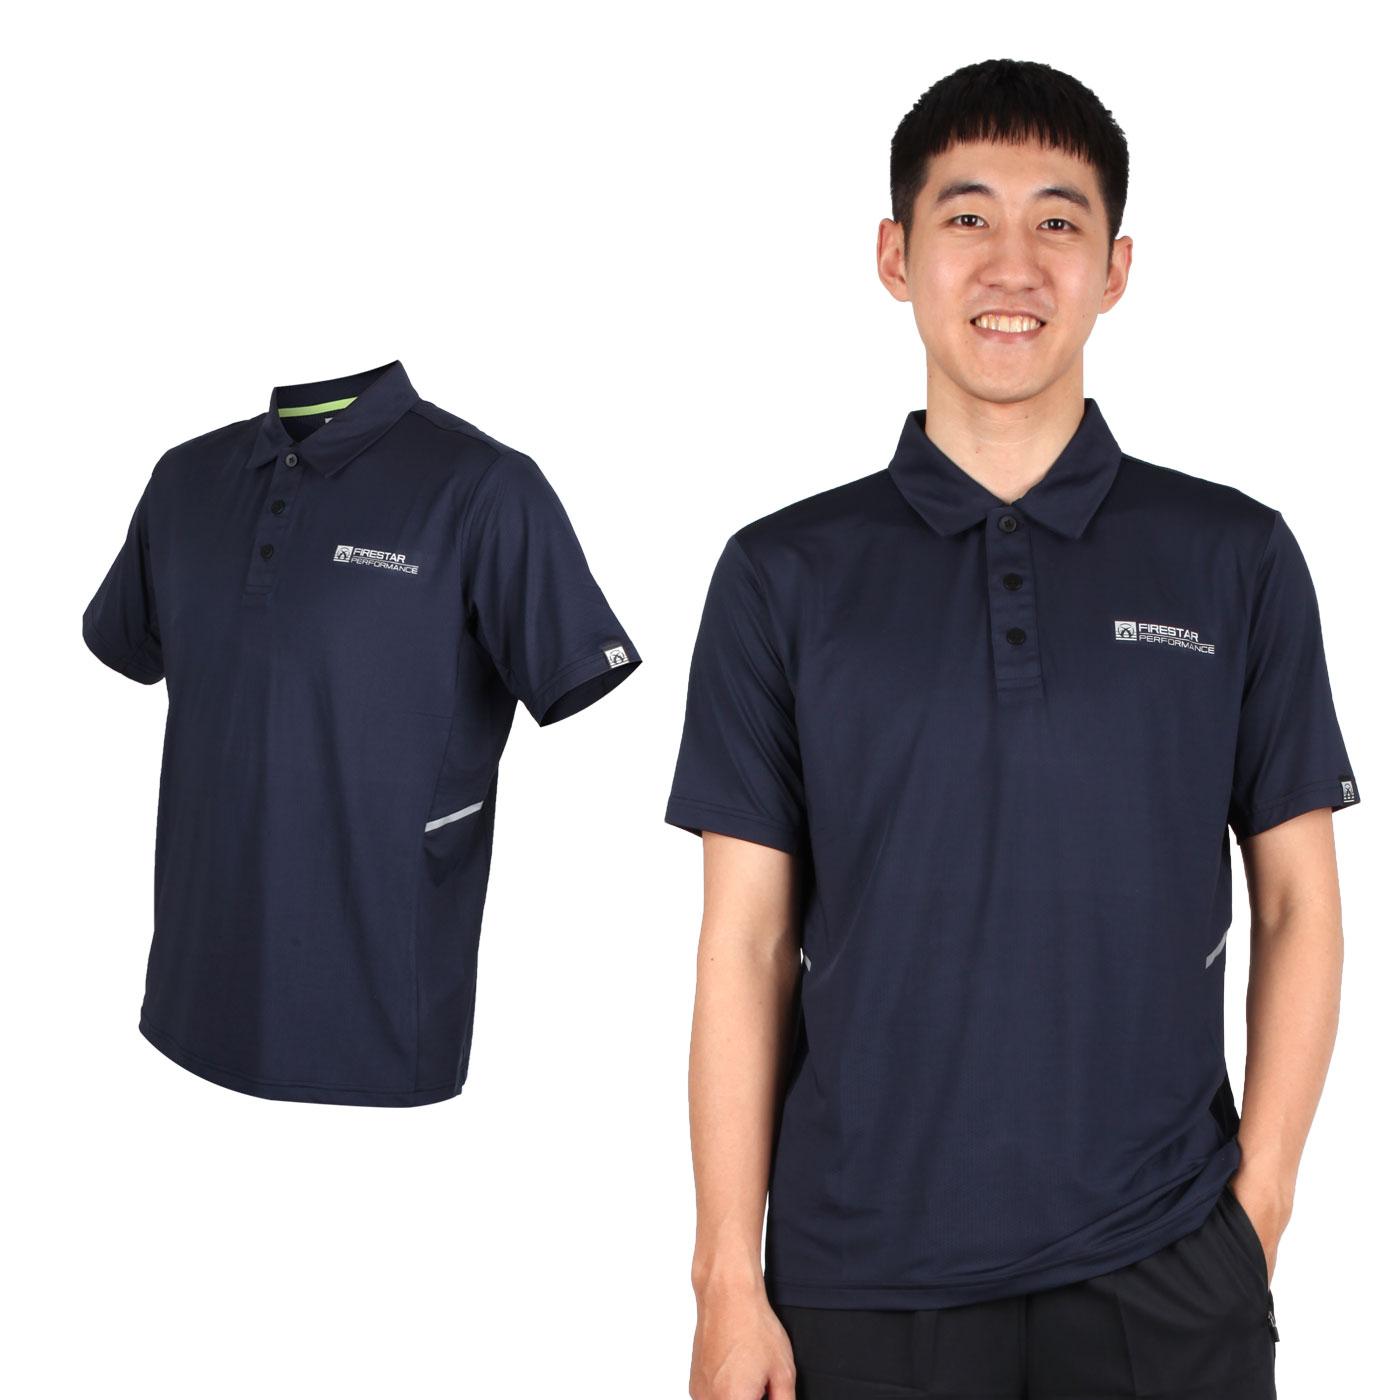 FIRESTAR 男款彈性短袖POLO衫 D9252-10 - 丈青銀